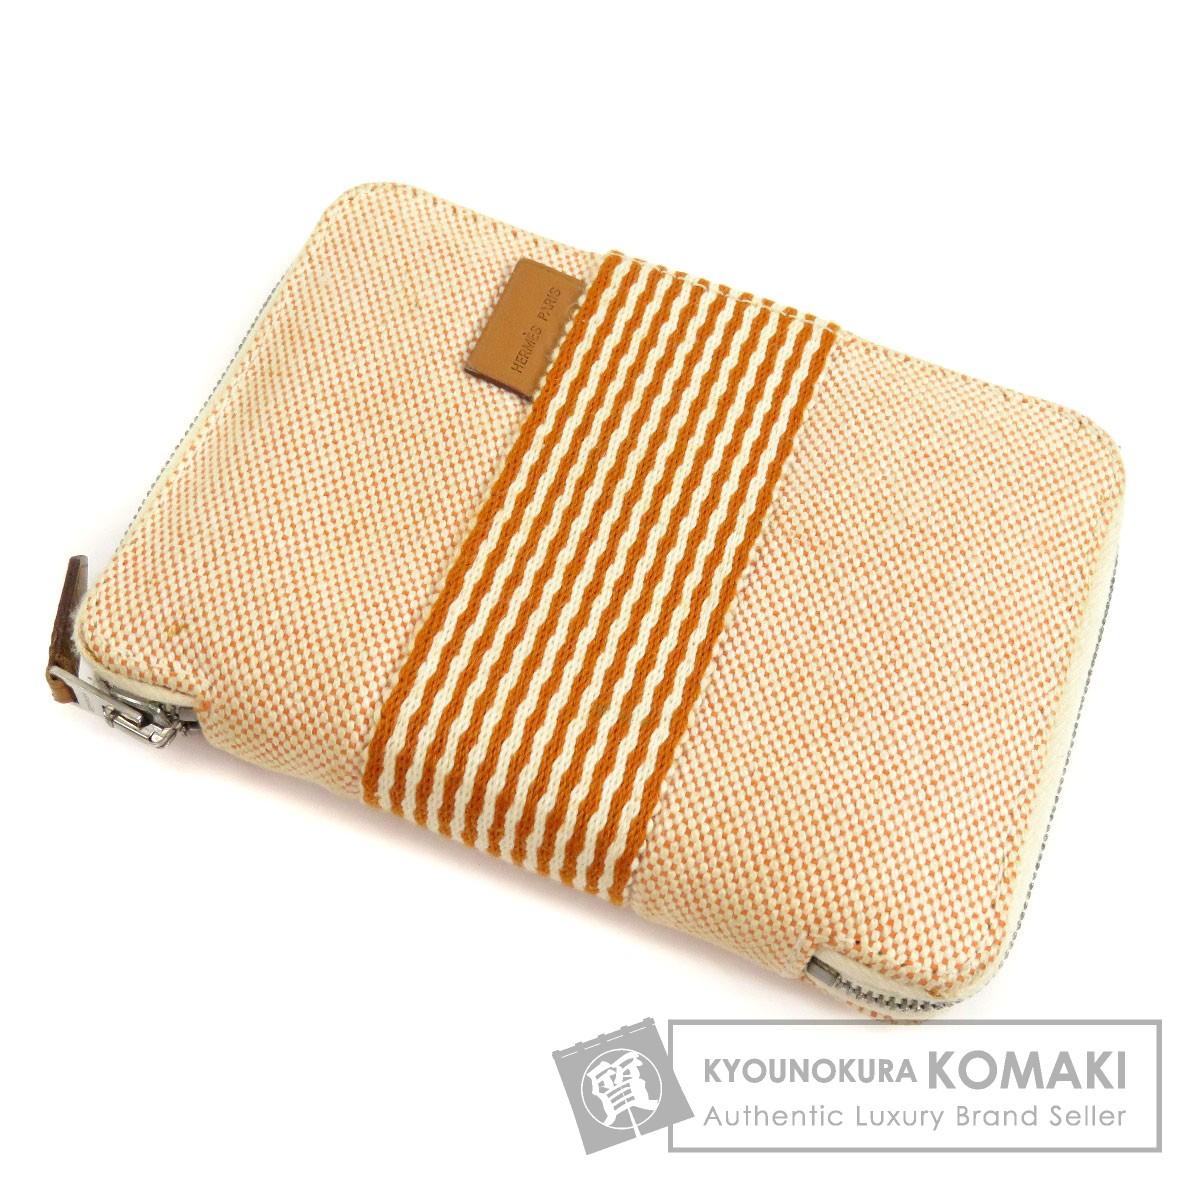 HERMES トワルアッシュ 二つ折り財布(小銭入れあり) キャンバス レディース 【中古】【エルメス】